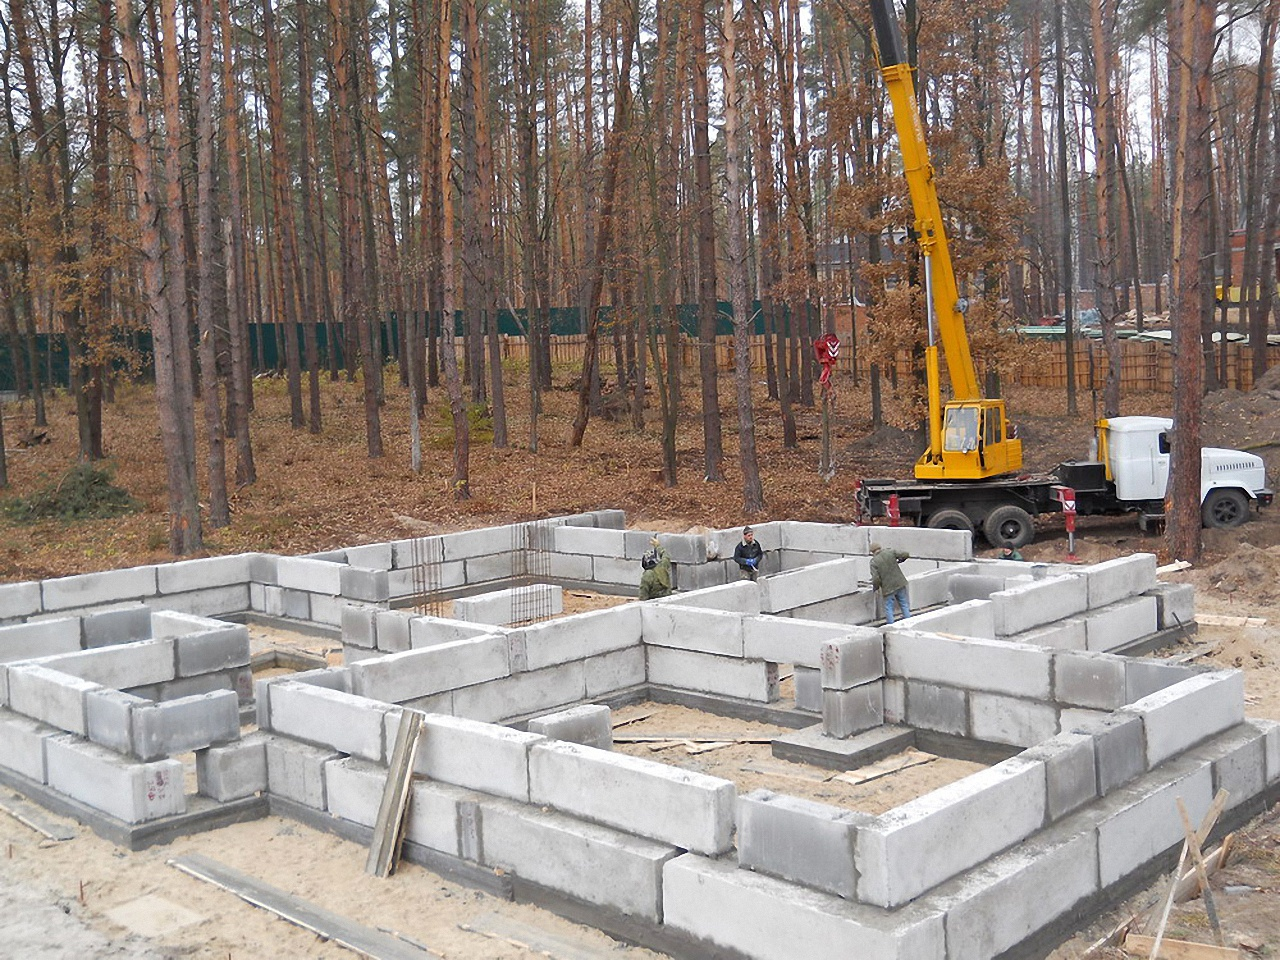 блоки под строительство дома